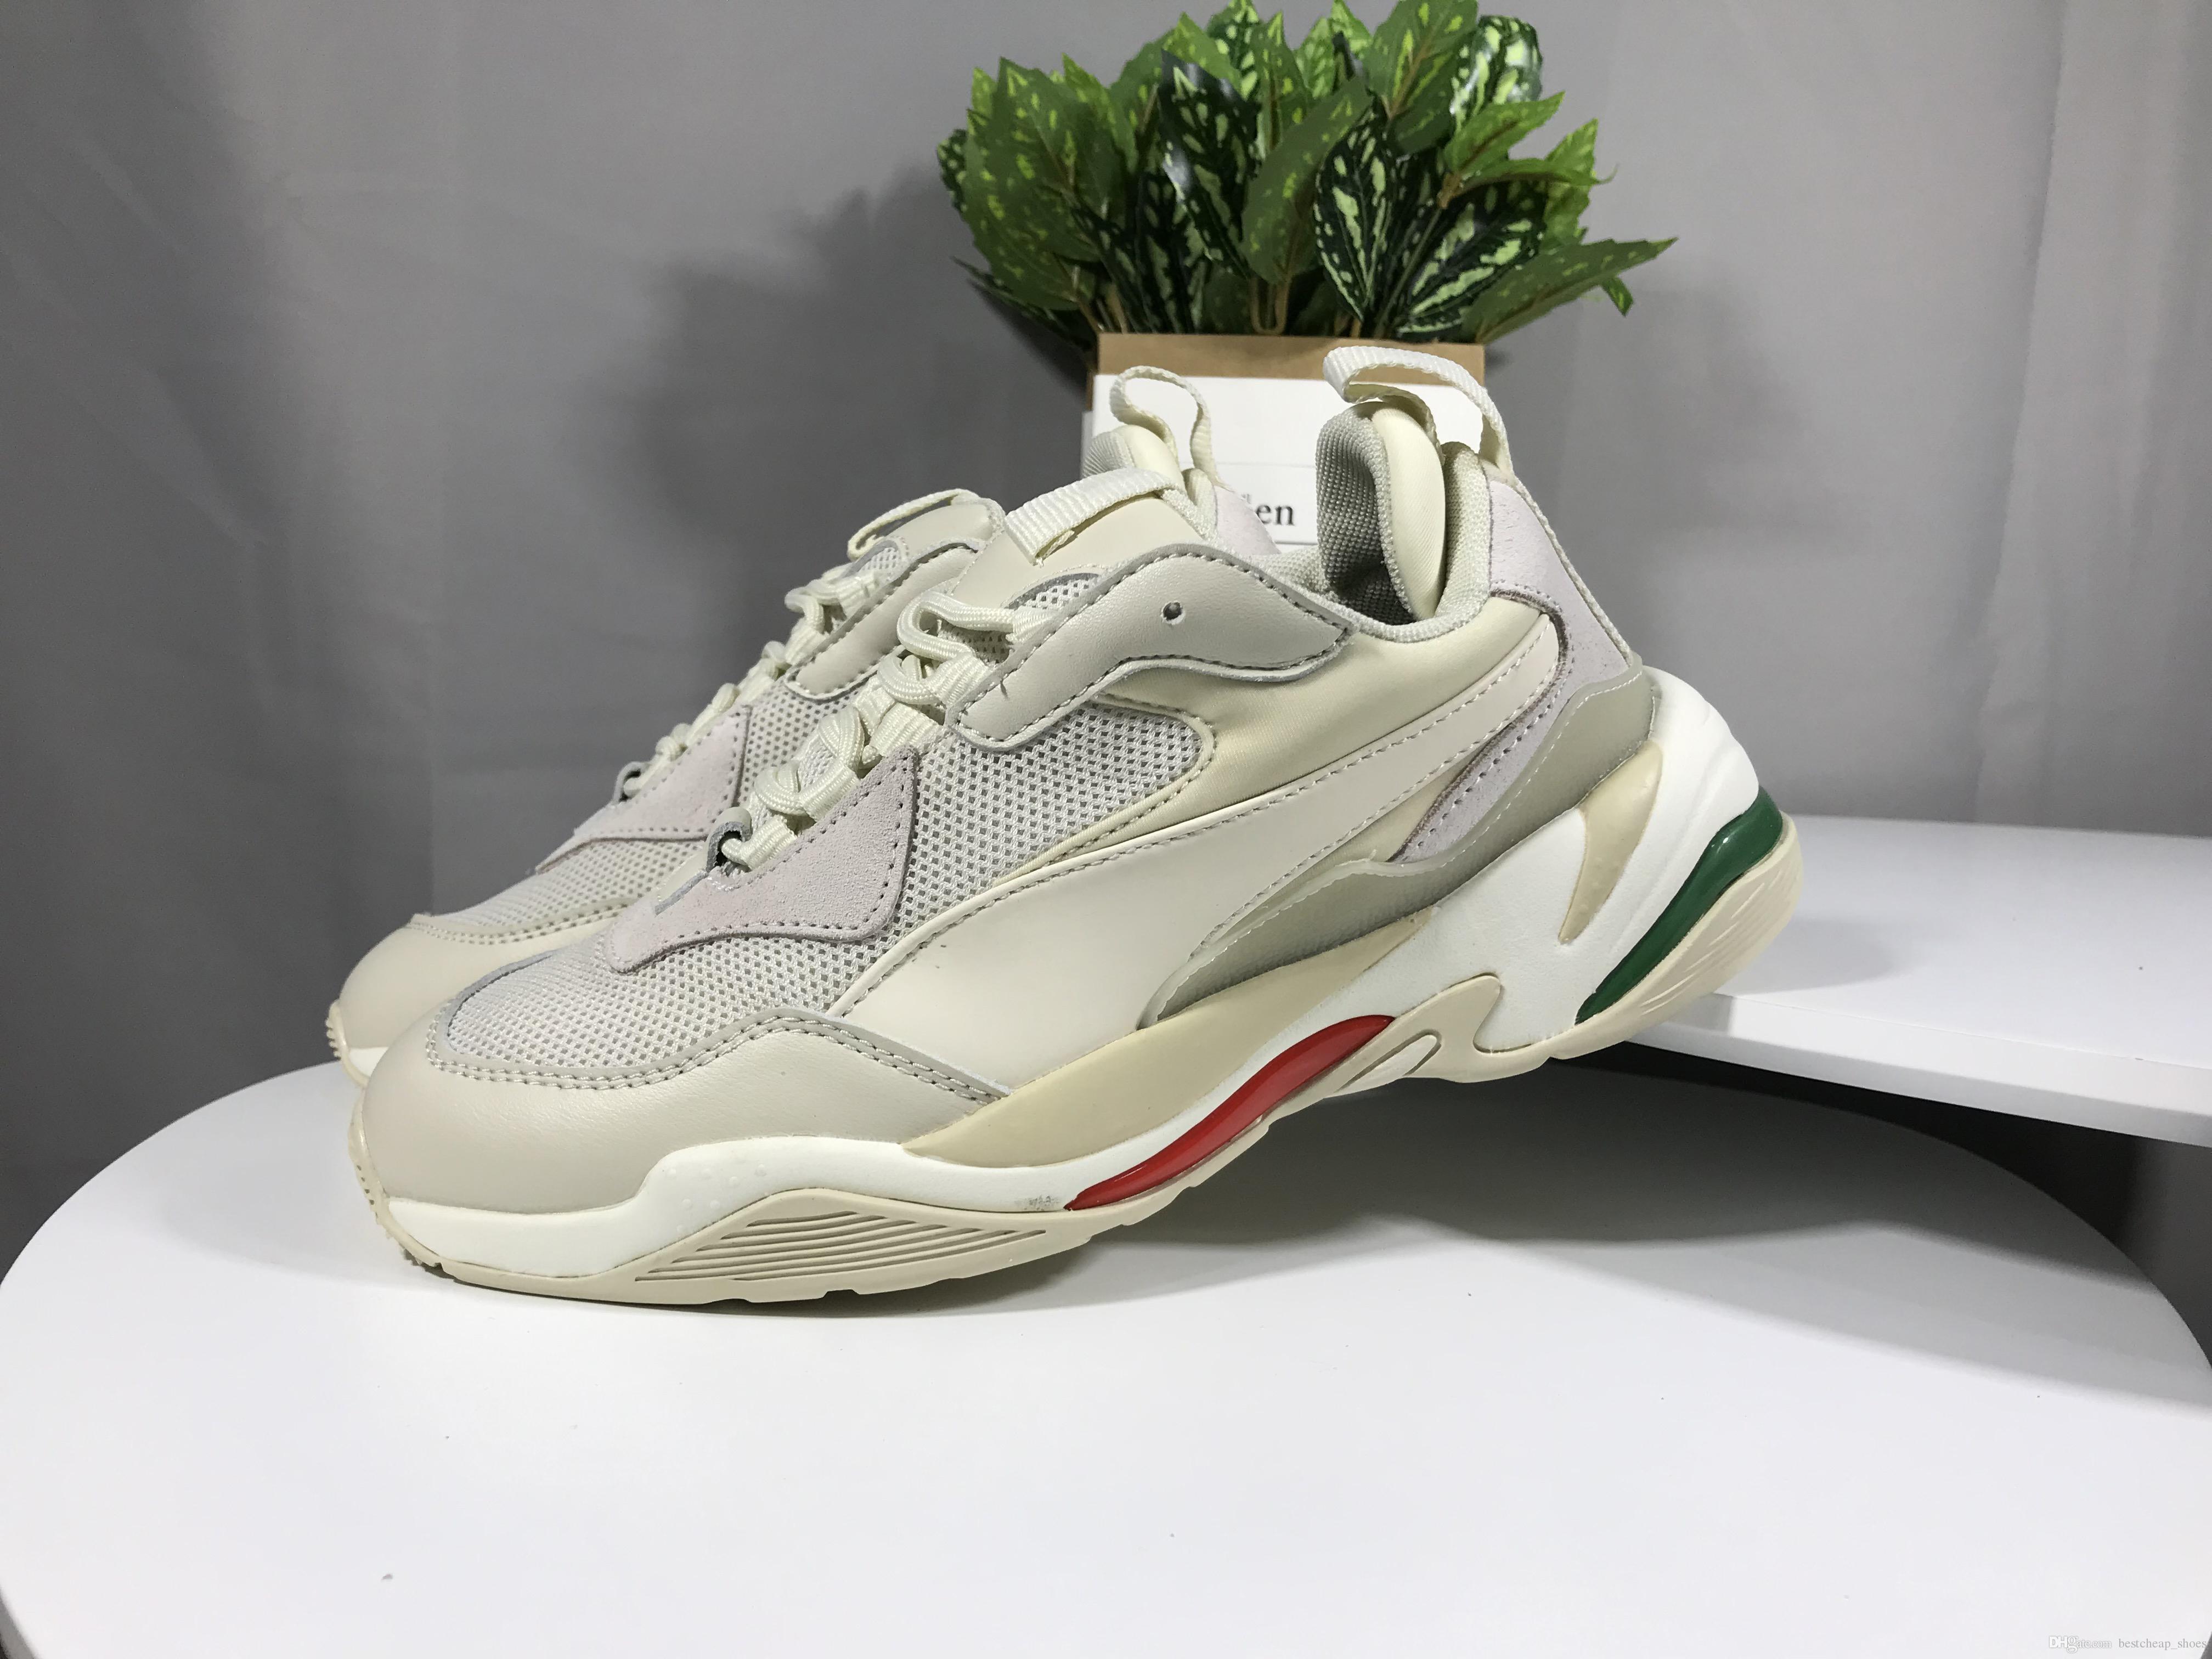 brand new ac900 396e8 Geox Scarpe Puma Novità Scarpe Da Ginnastica Thunder Spectra Green Ace  Scarpe Da Uomo Di Design Python Scarpe Da Donna Di Lusso Brand Casual  Sneaker Triple ...